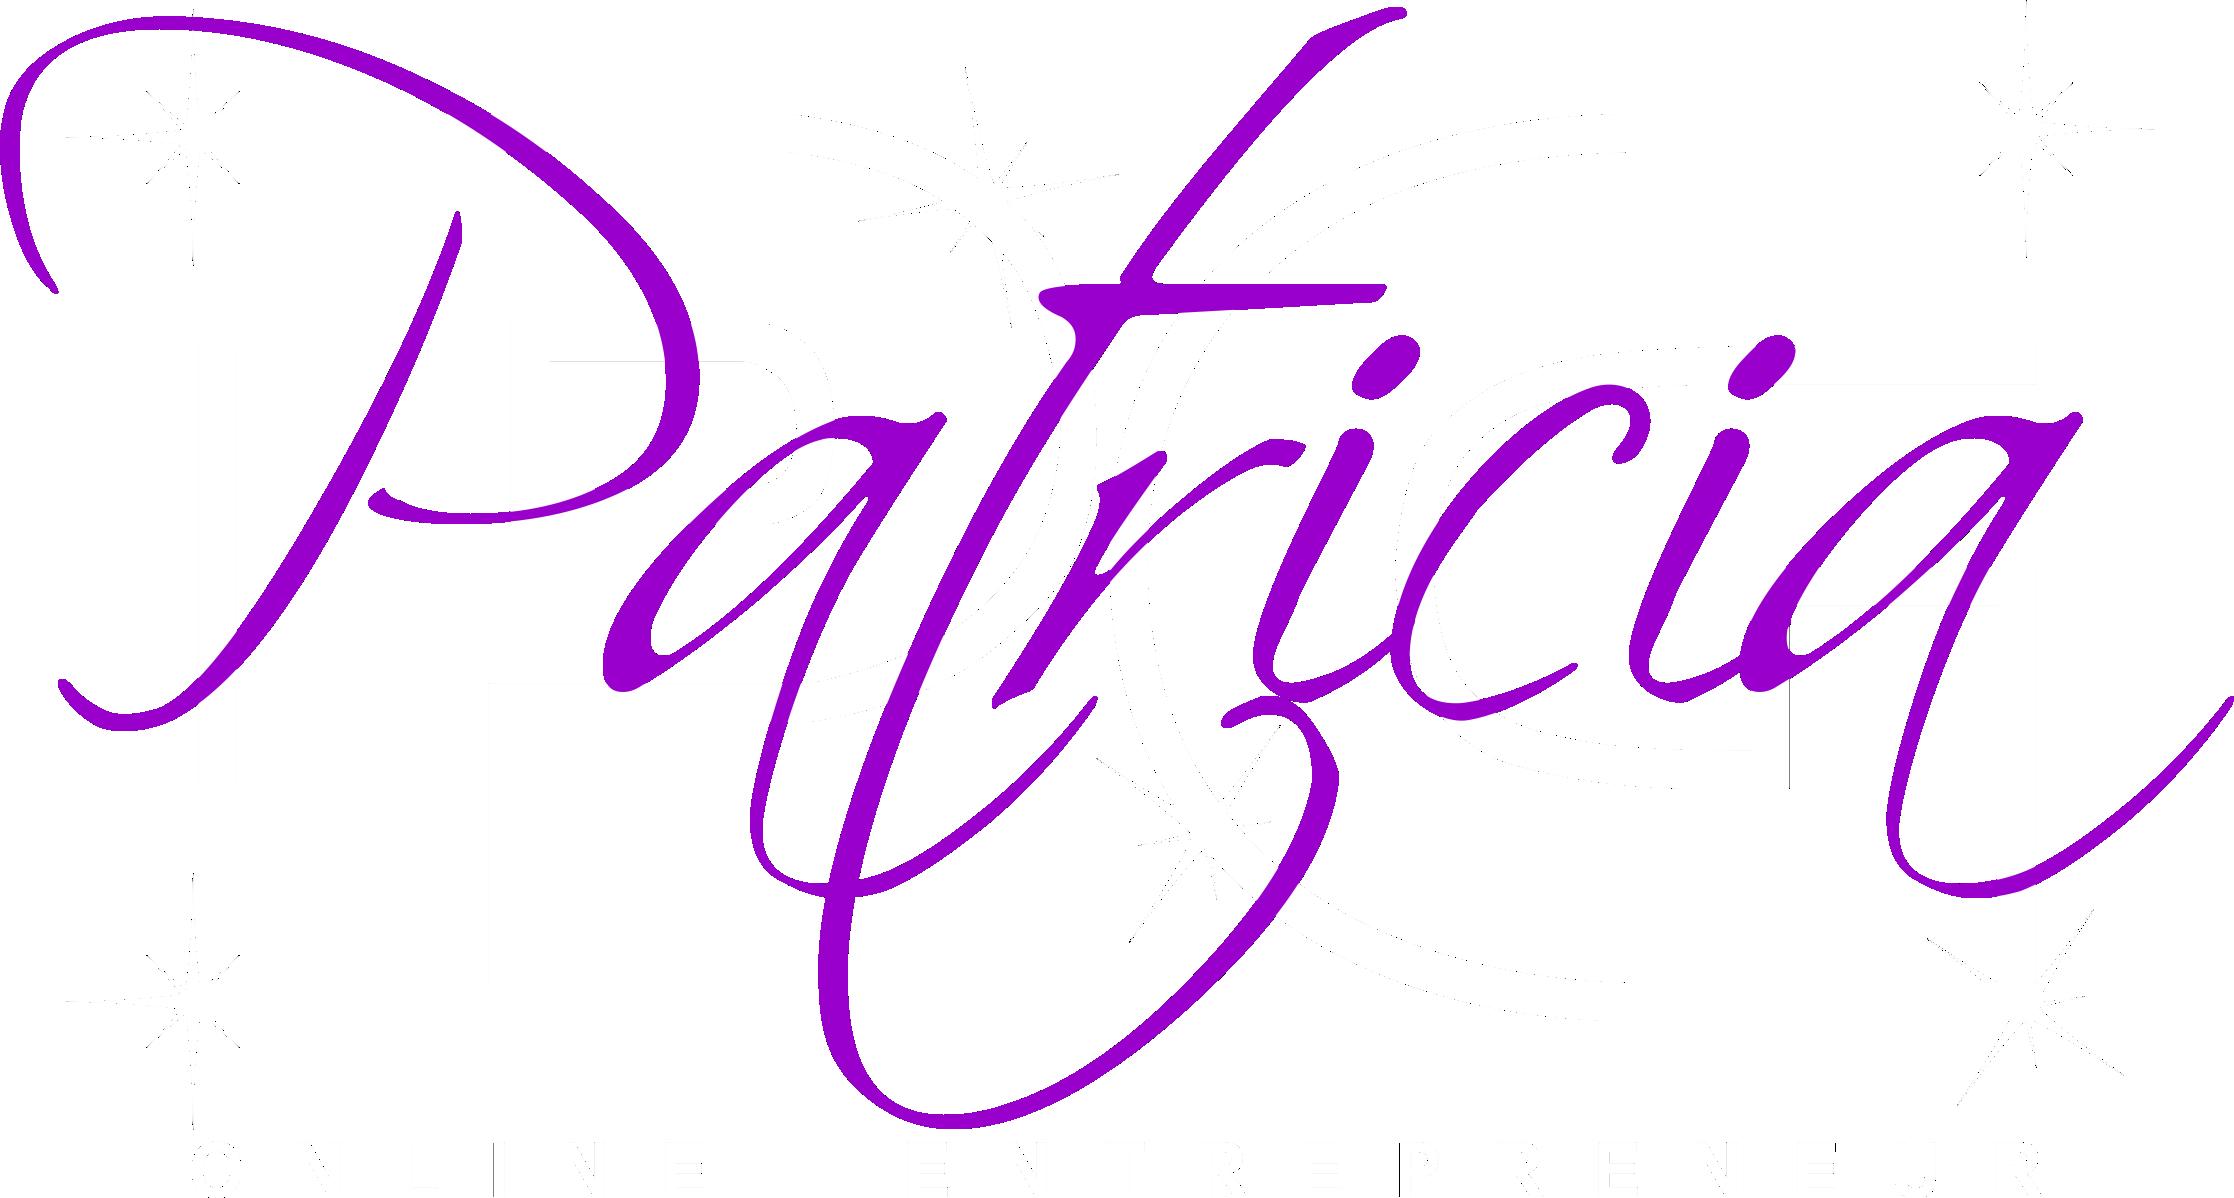 www.onlinewithpatricia.com